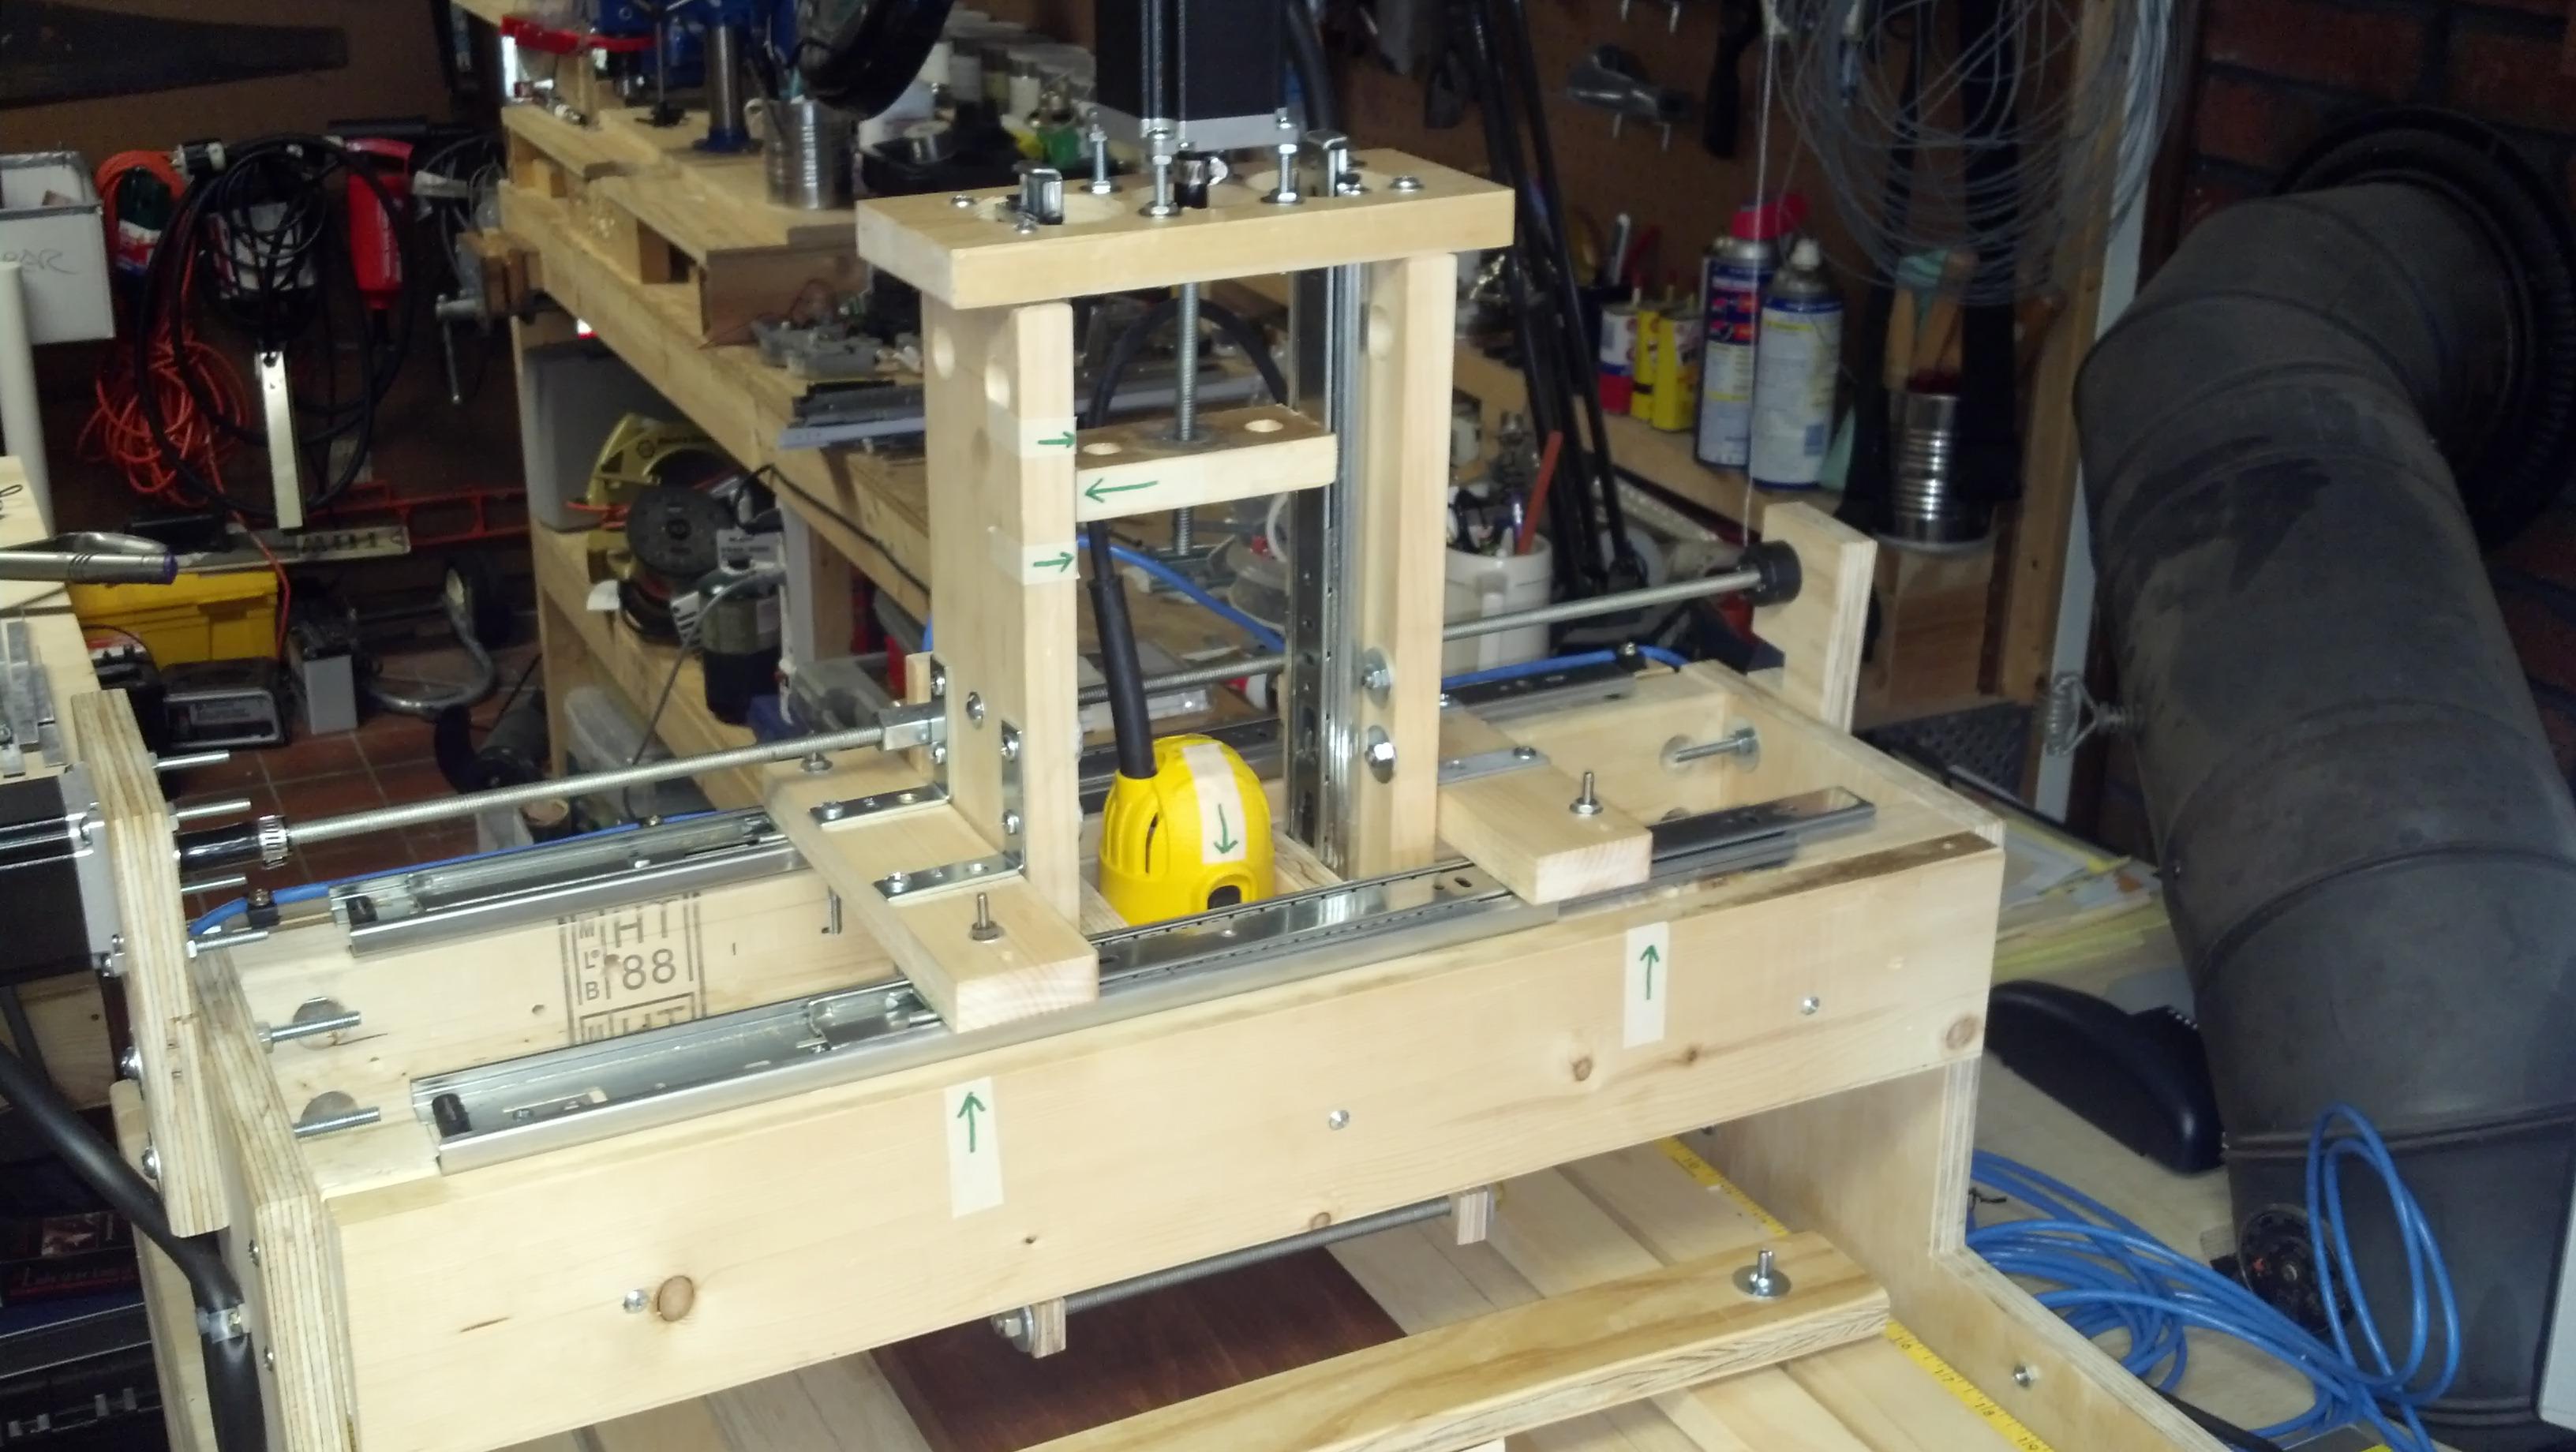 DIY Drawerslide CNC Machine - Gantry Re-design